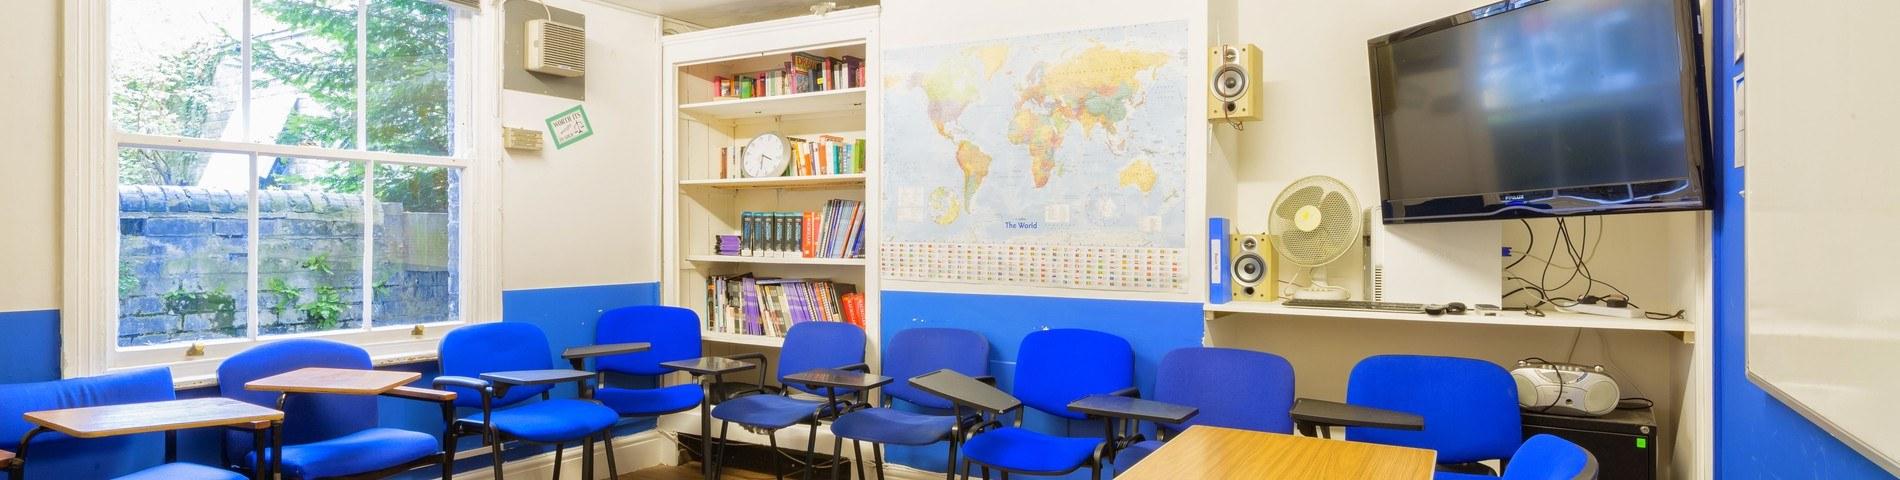 LSI - Language Studies International obrazek 1